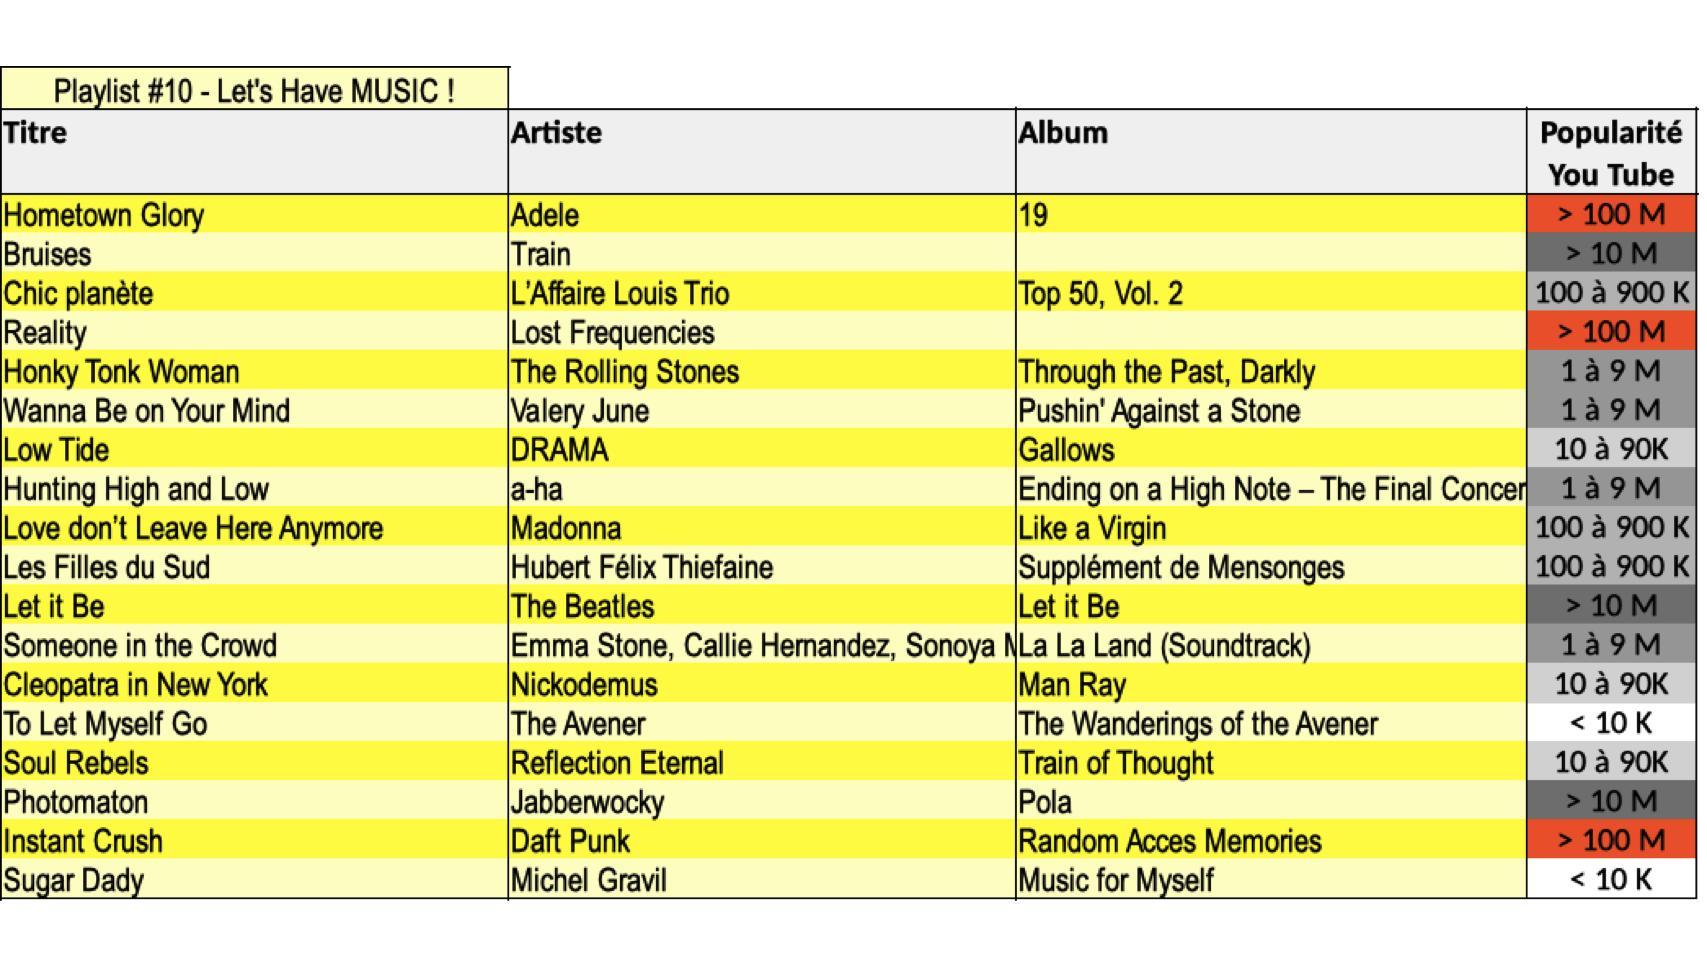 Liste Playlist 10